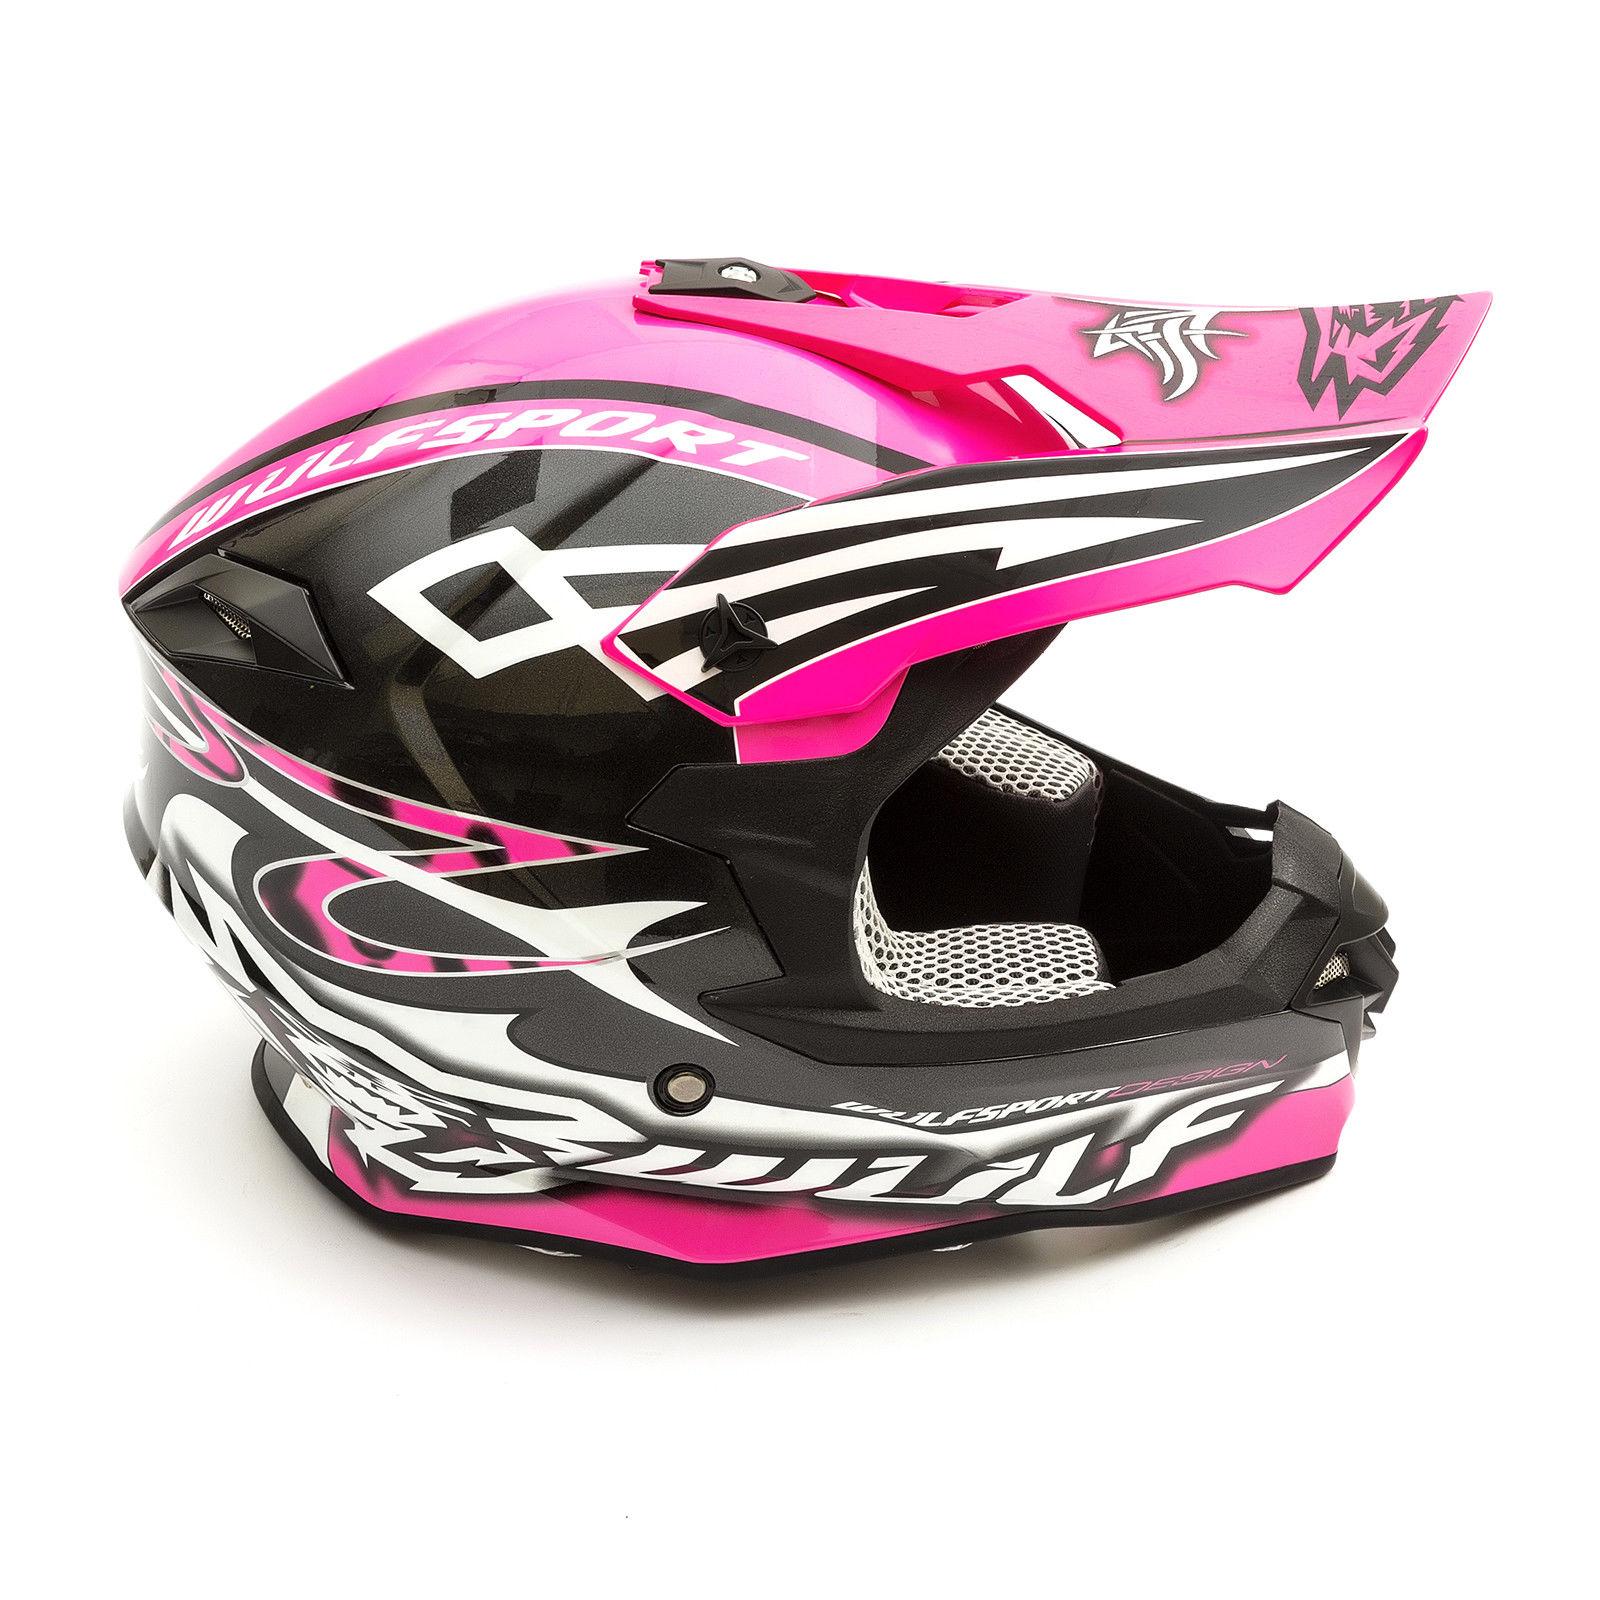 Wulfsport-Adult-Sceptre-Helmets-Motocross-Pitbike-Motorbike-Off-Road-Racing-ATV thumbnail 44